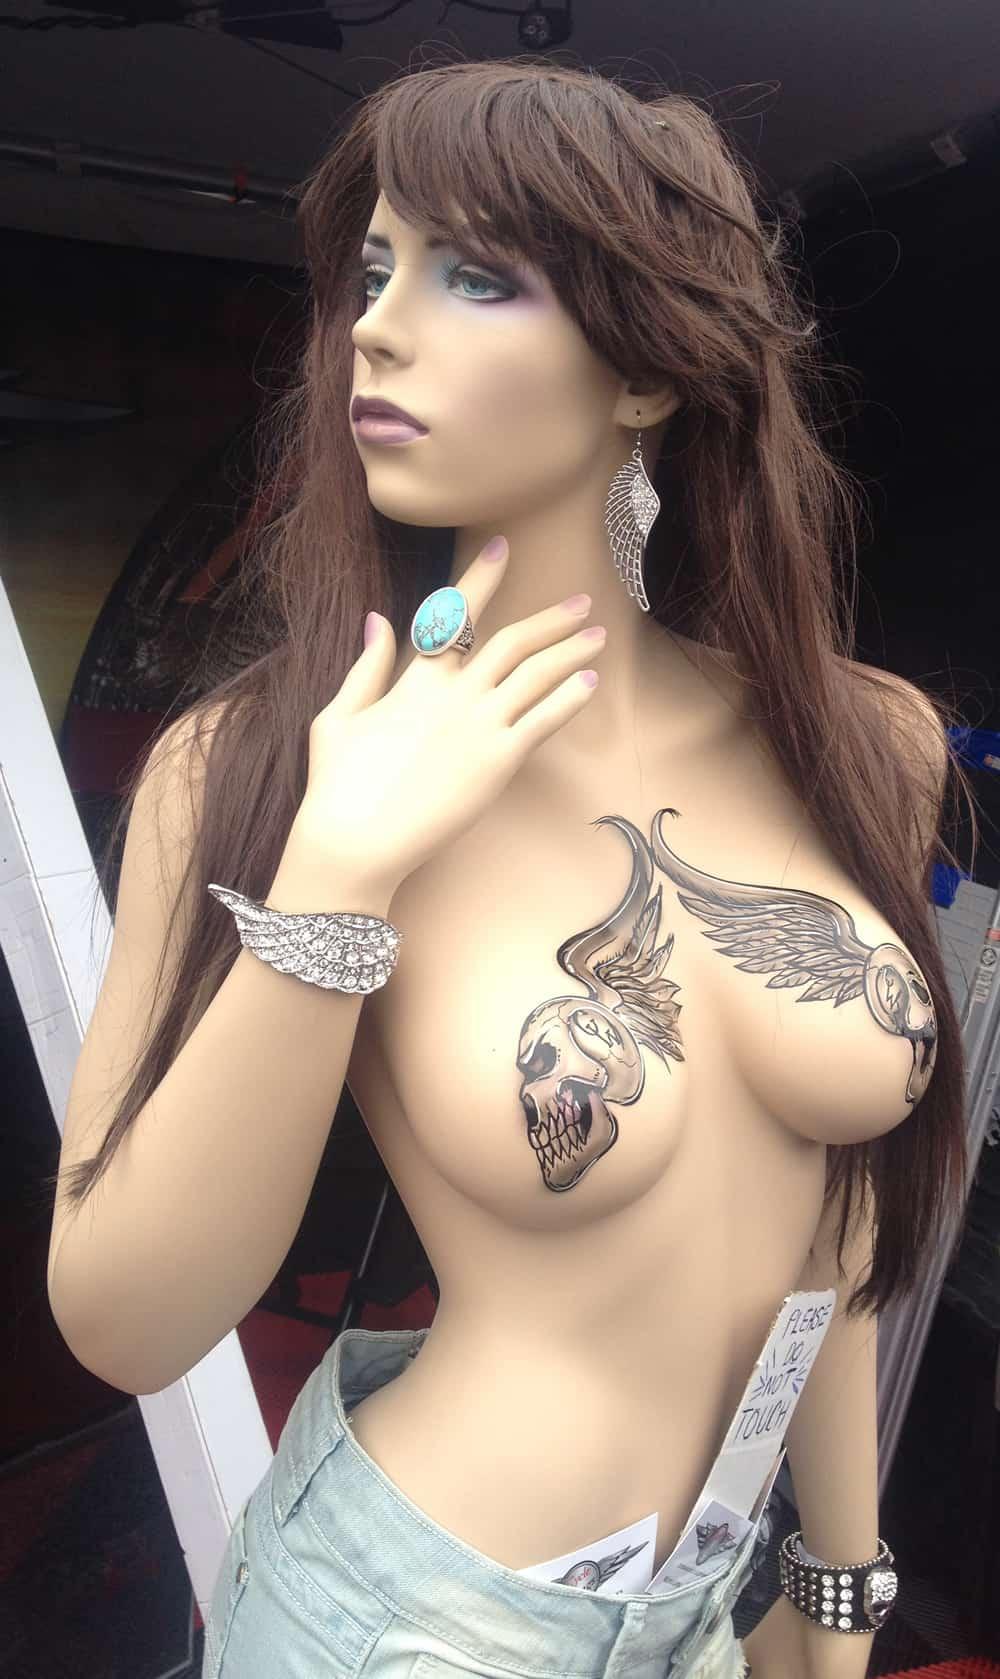 Mannequin Babe at Bike Week 2014